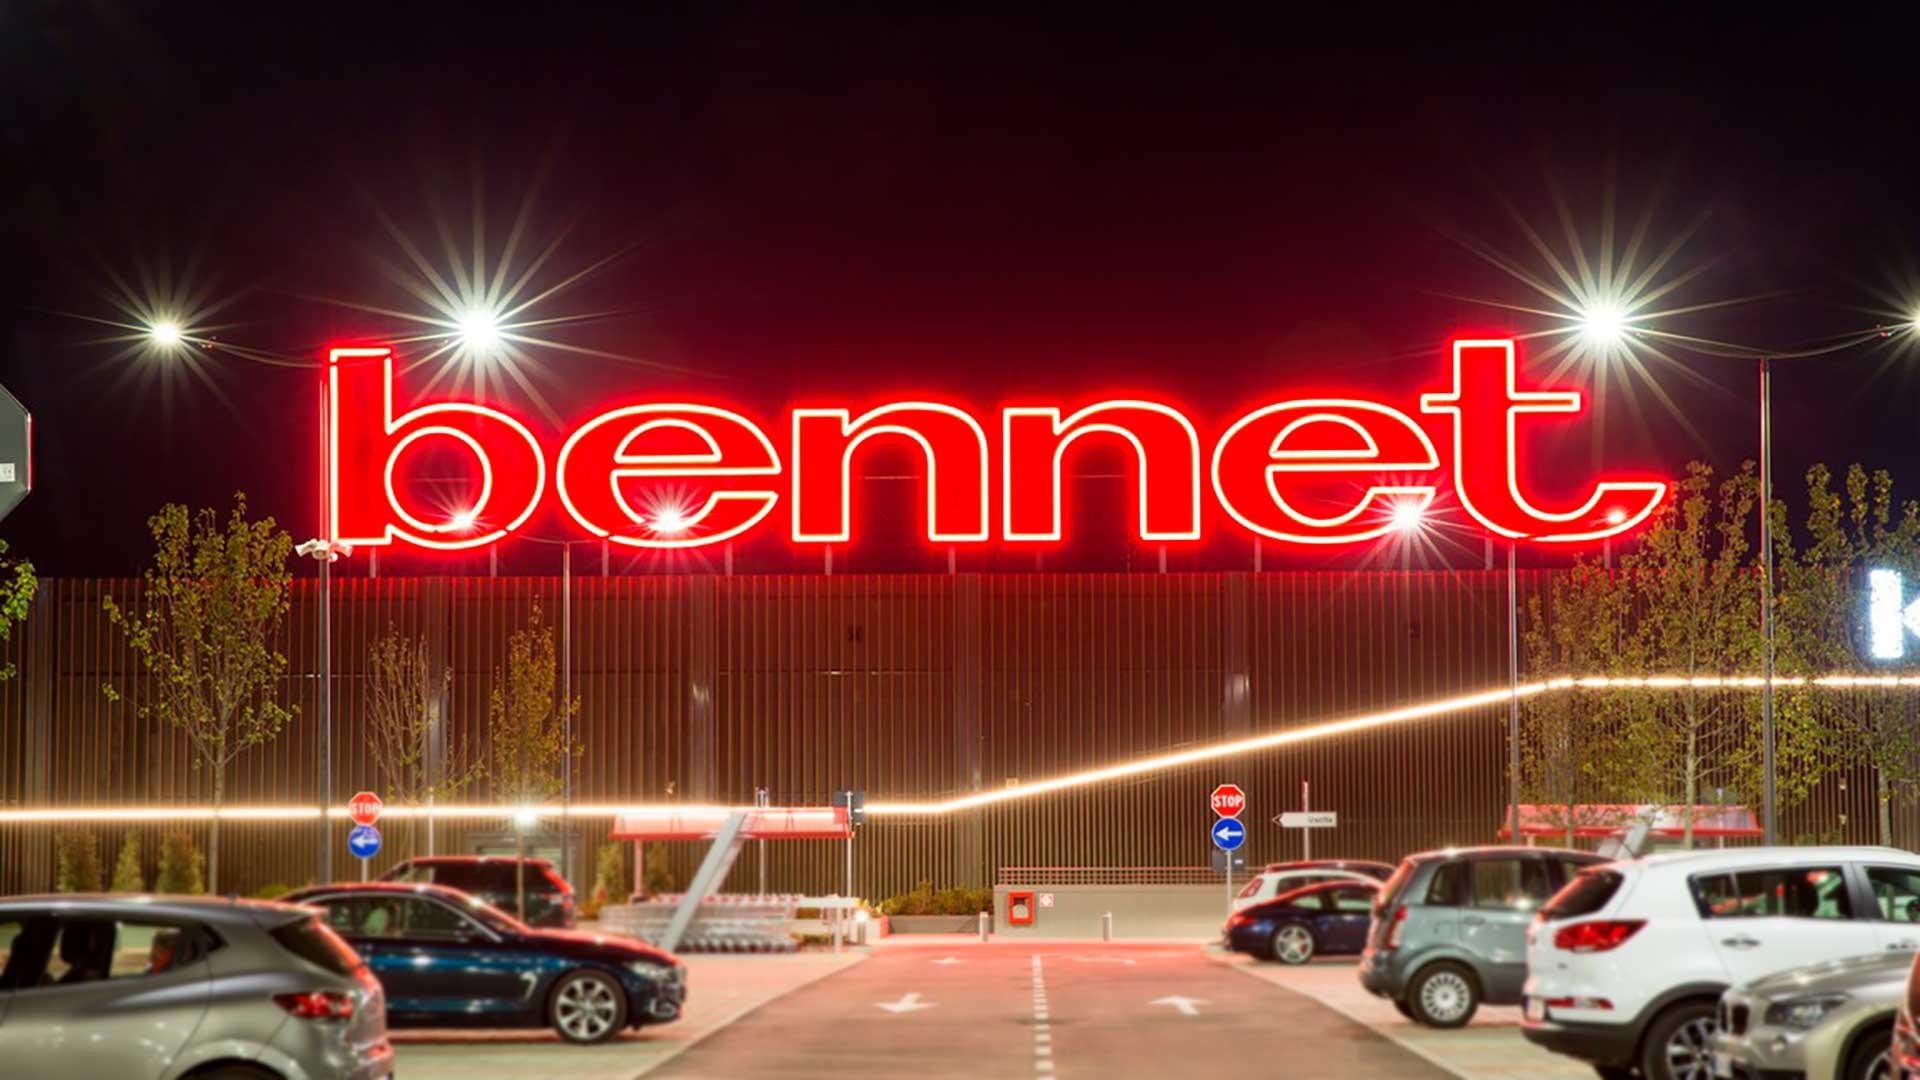 bennet-supermercato